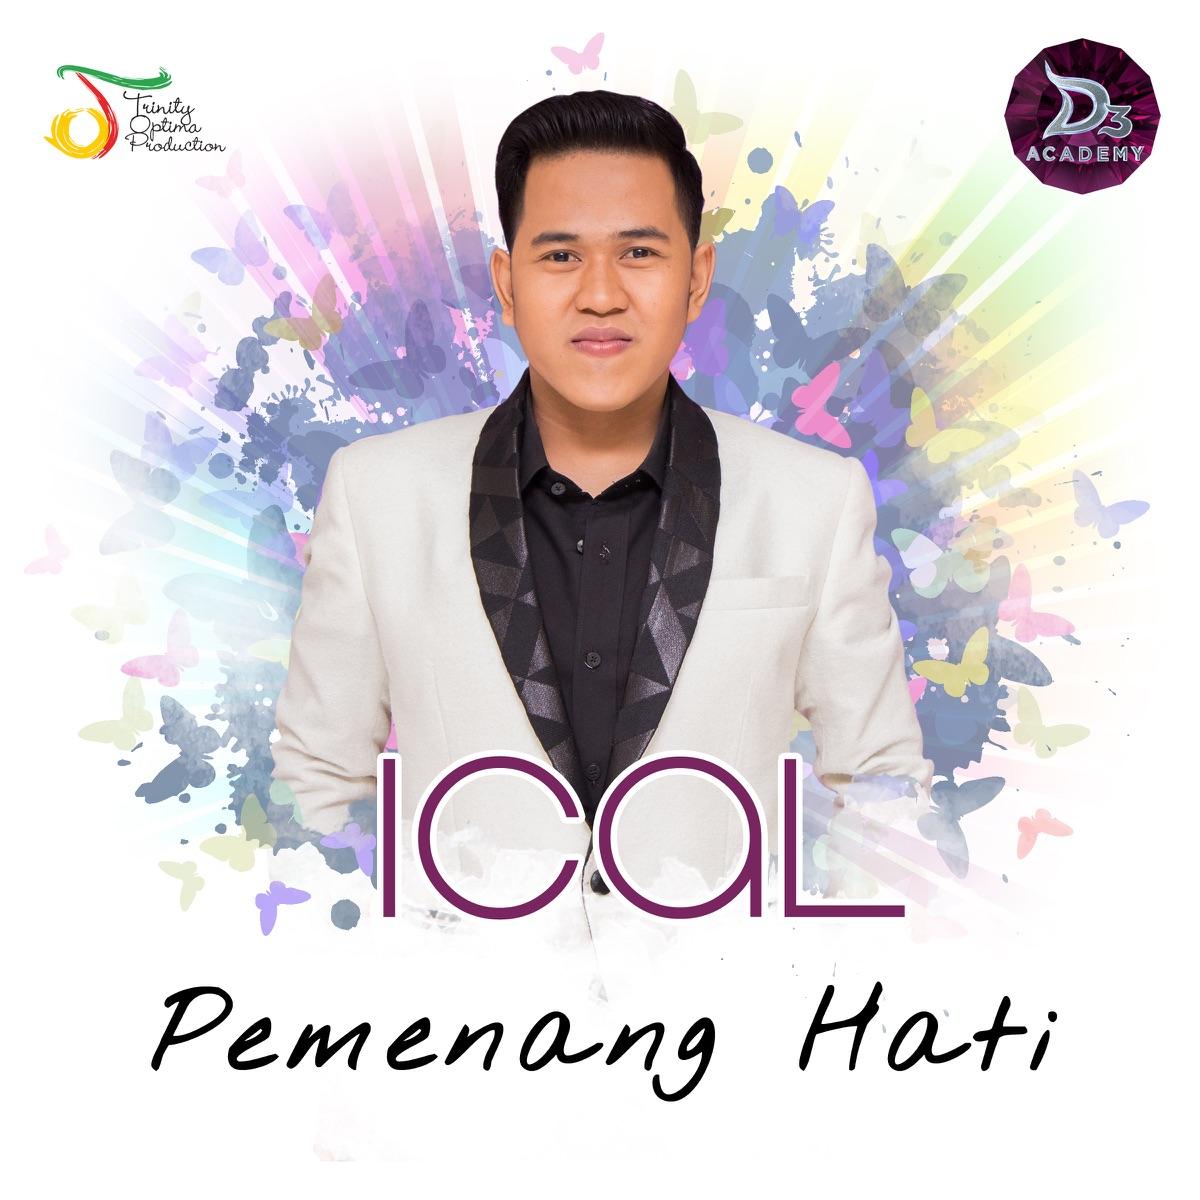 Pemenang Hati - Single Ical DAcademy CD cover